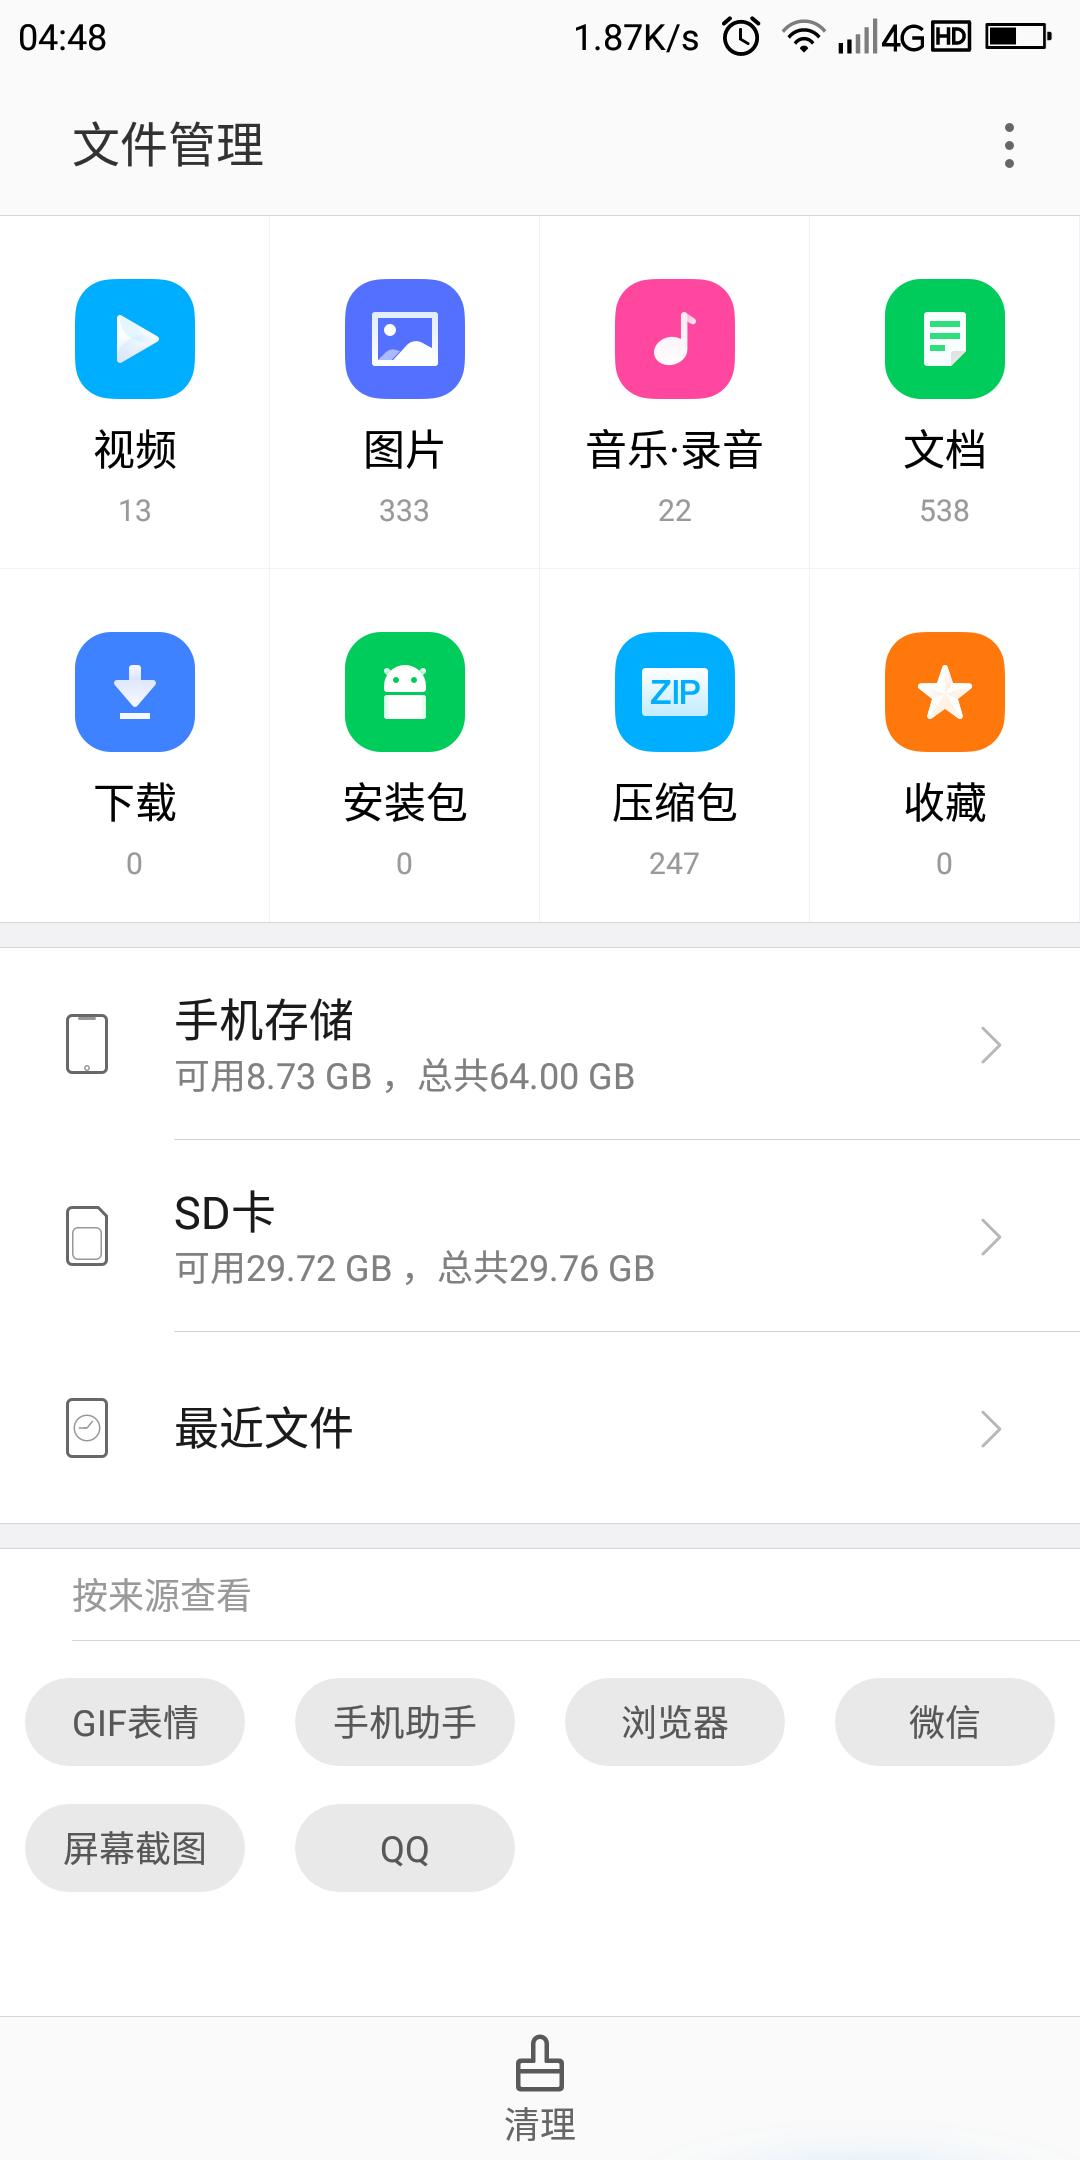 Screenshot_2019-08-28-04-48-32.png